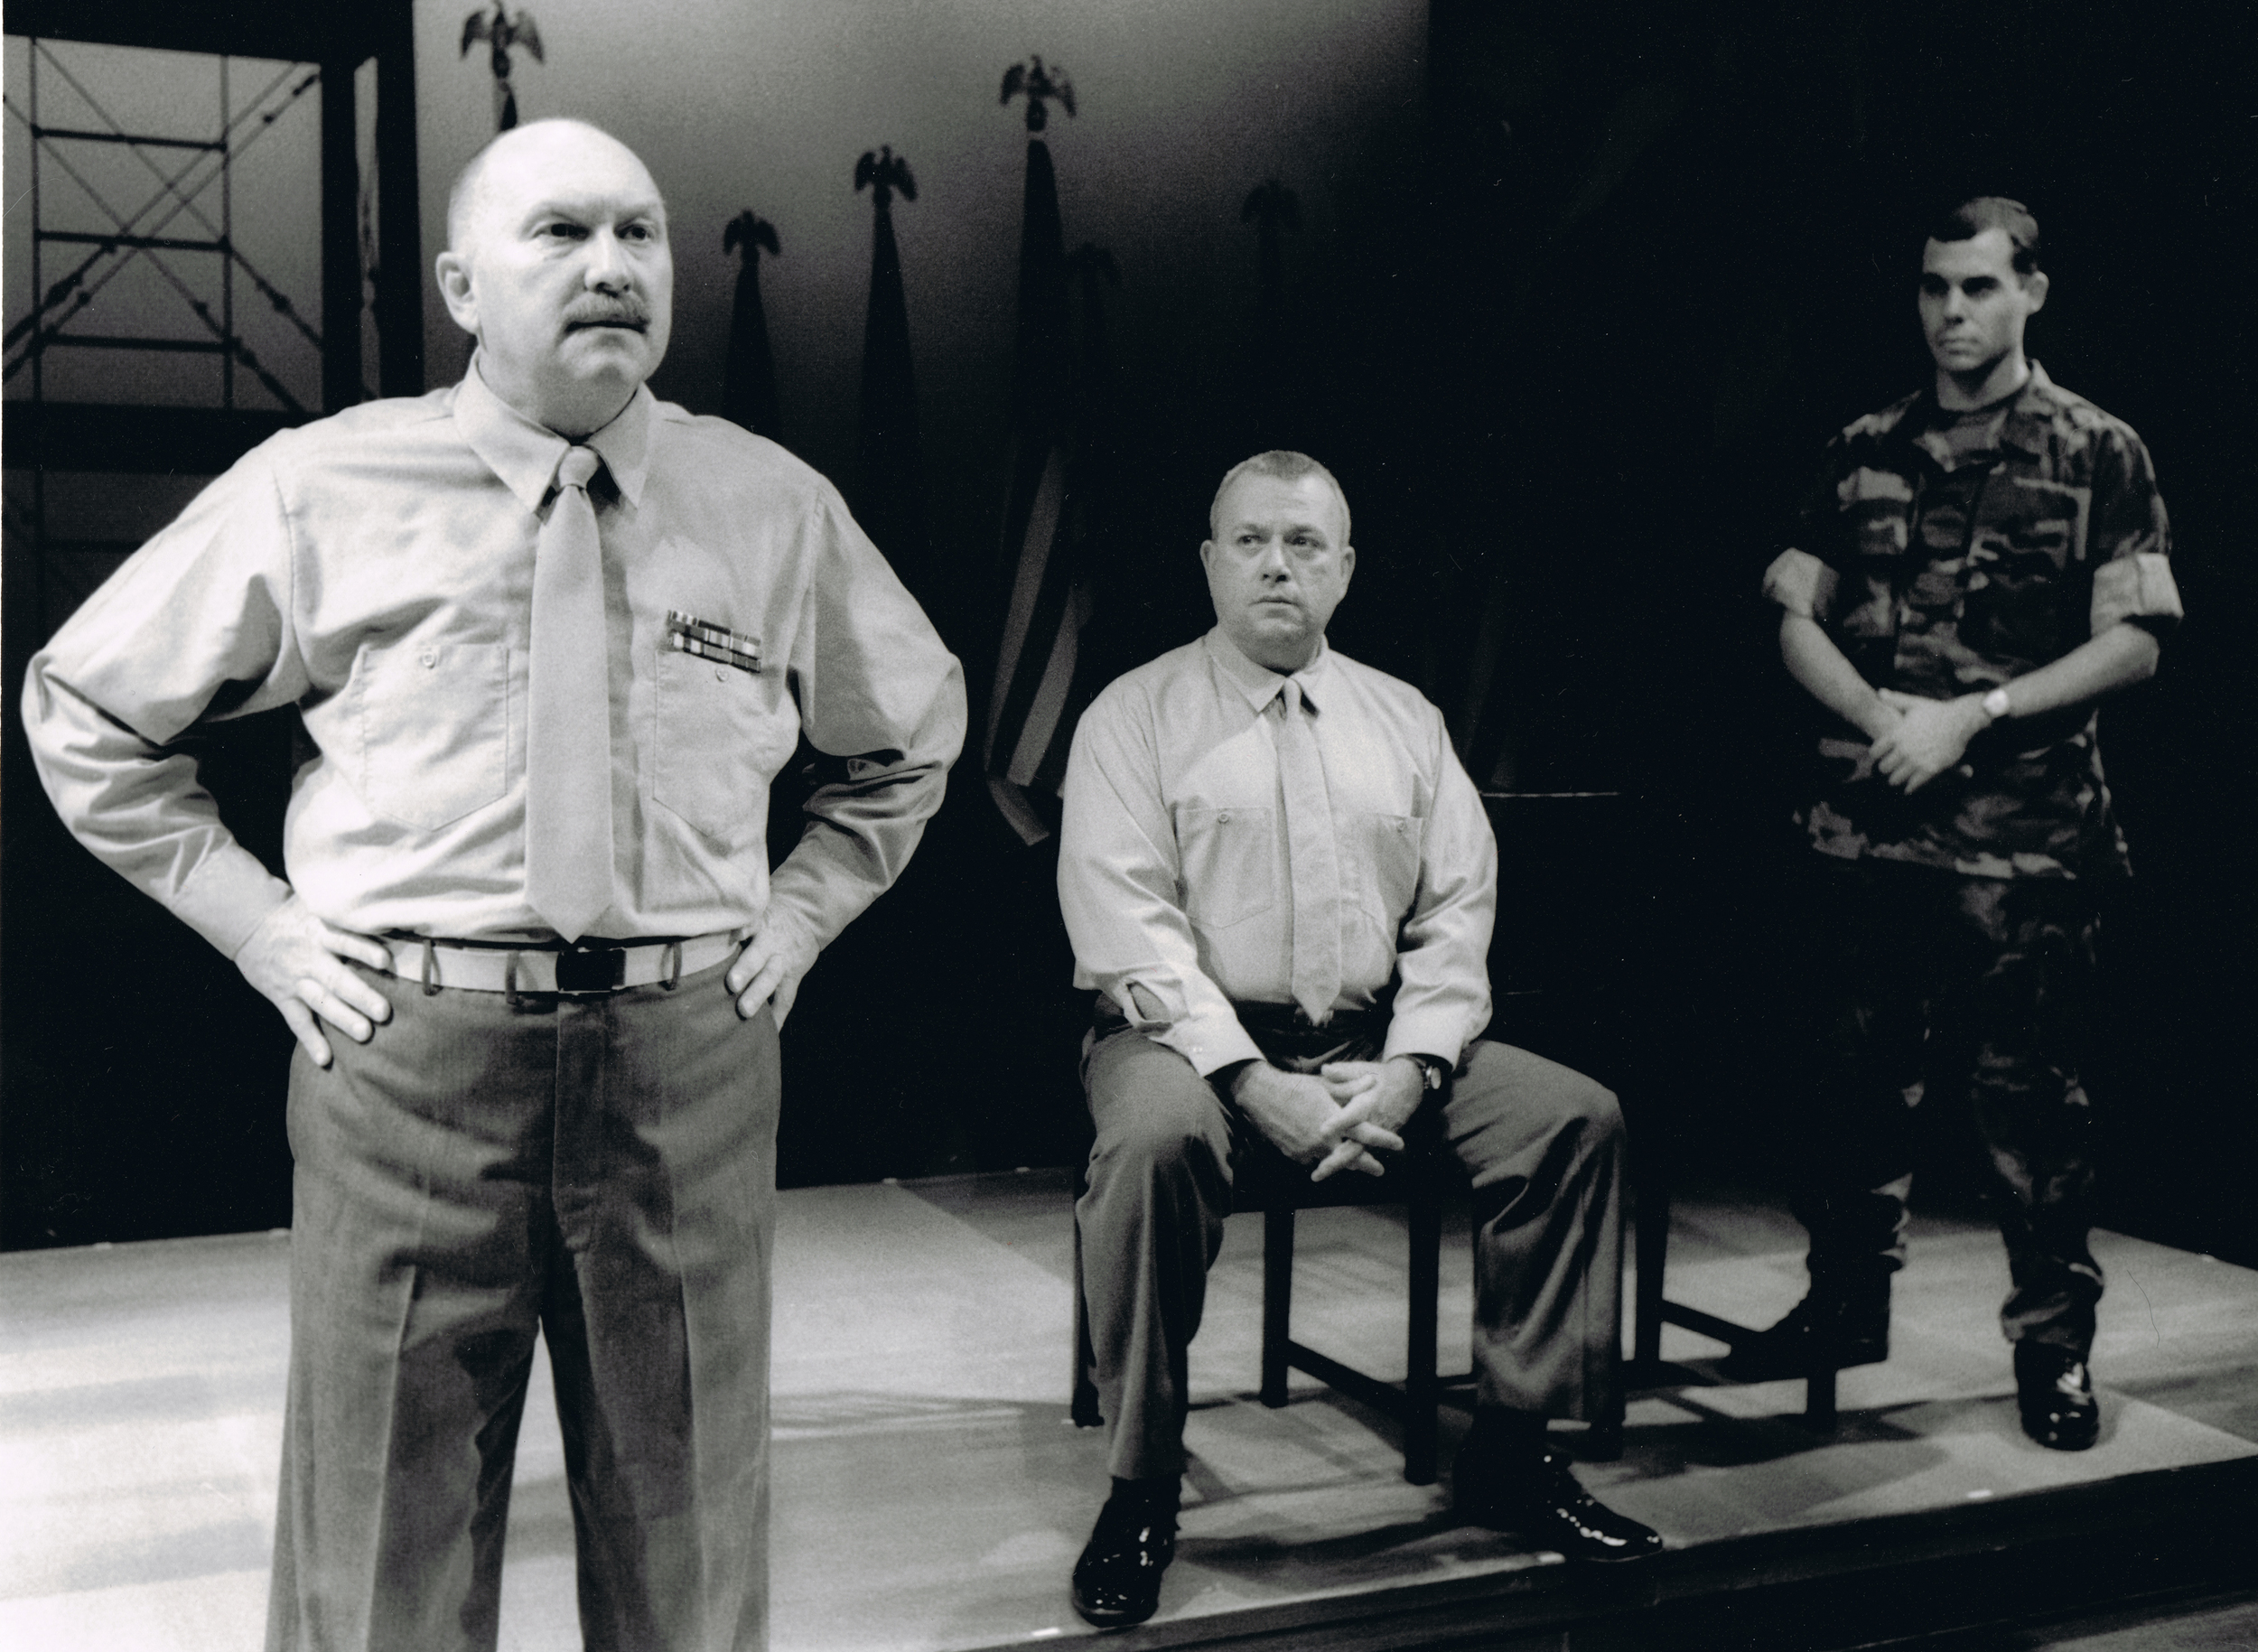 """Lt. Kendrick"" in A FEW GOOD MEN with Joel Hatch and Neil Friedman"